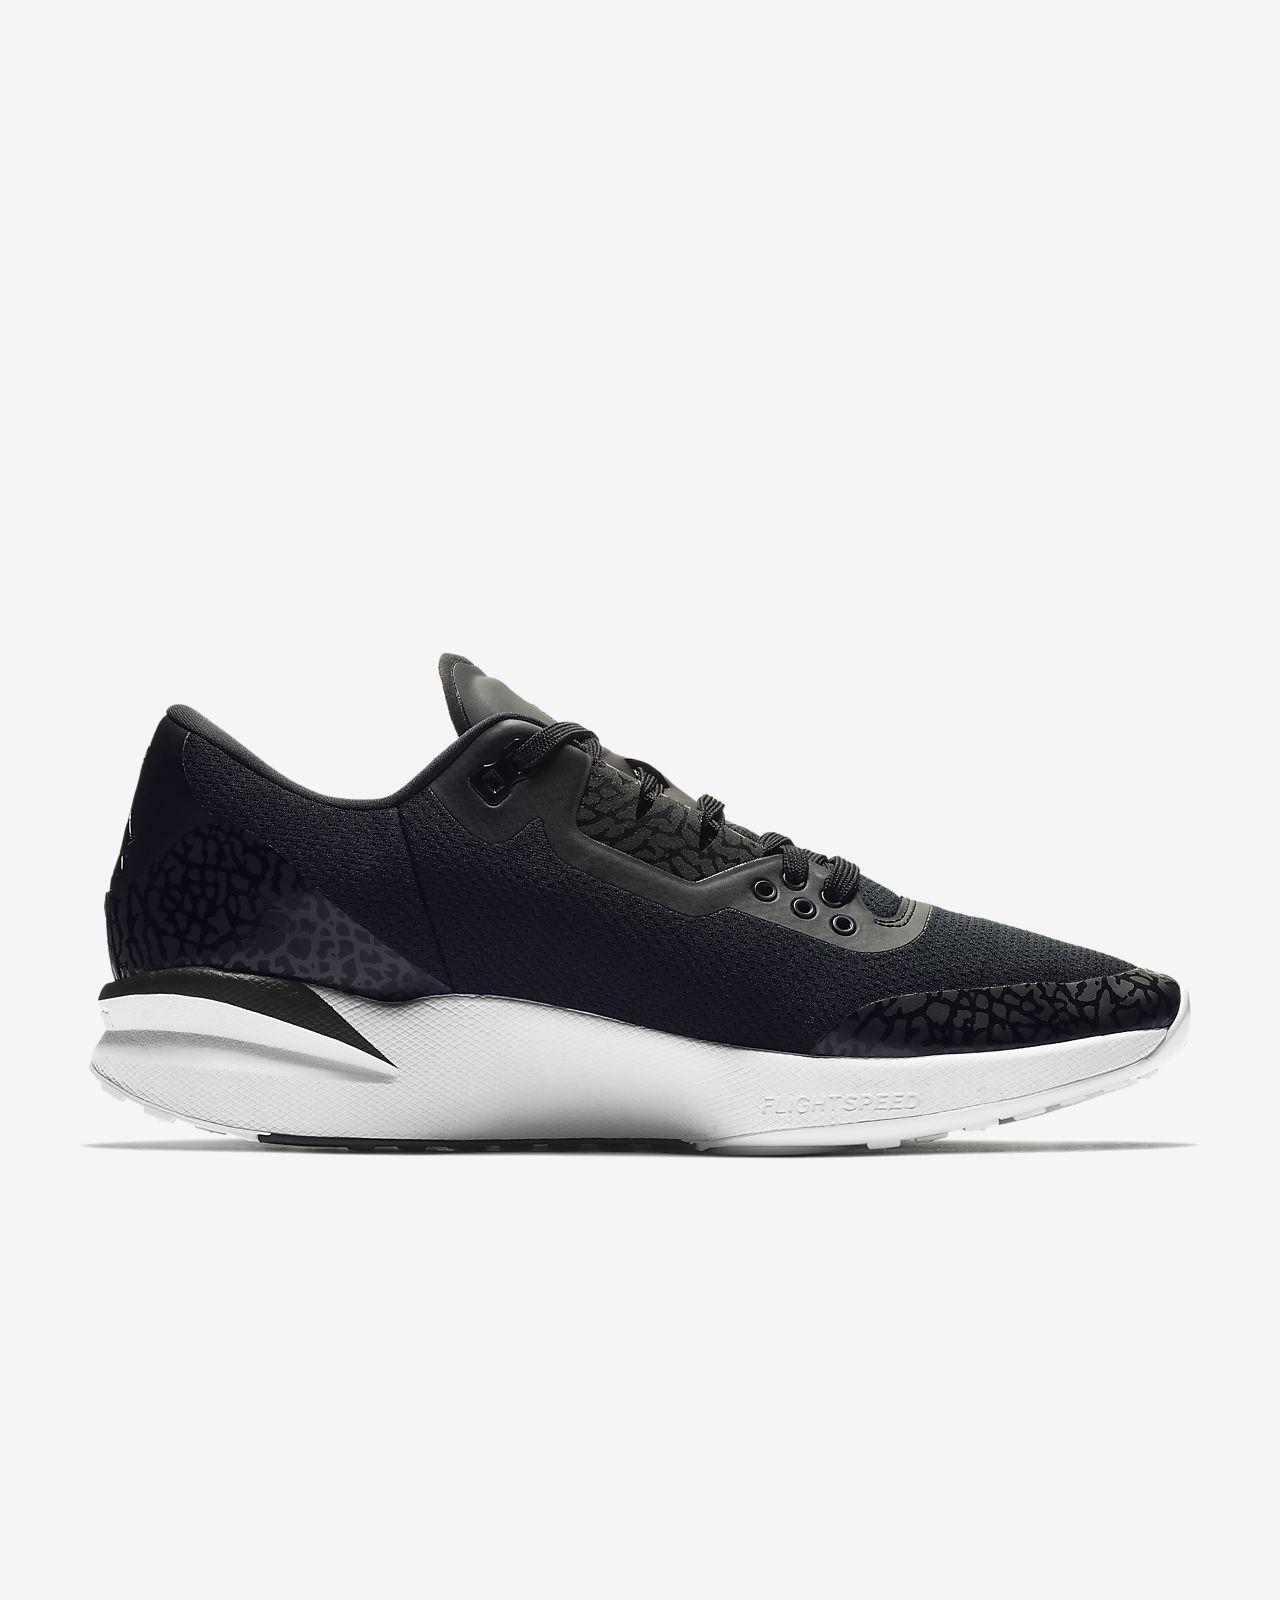 80866744a2fdac Jordan Zoom Tenacity 88 Men s Running Shoe. Nike.com